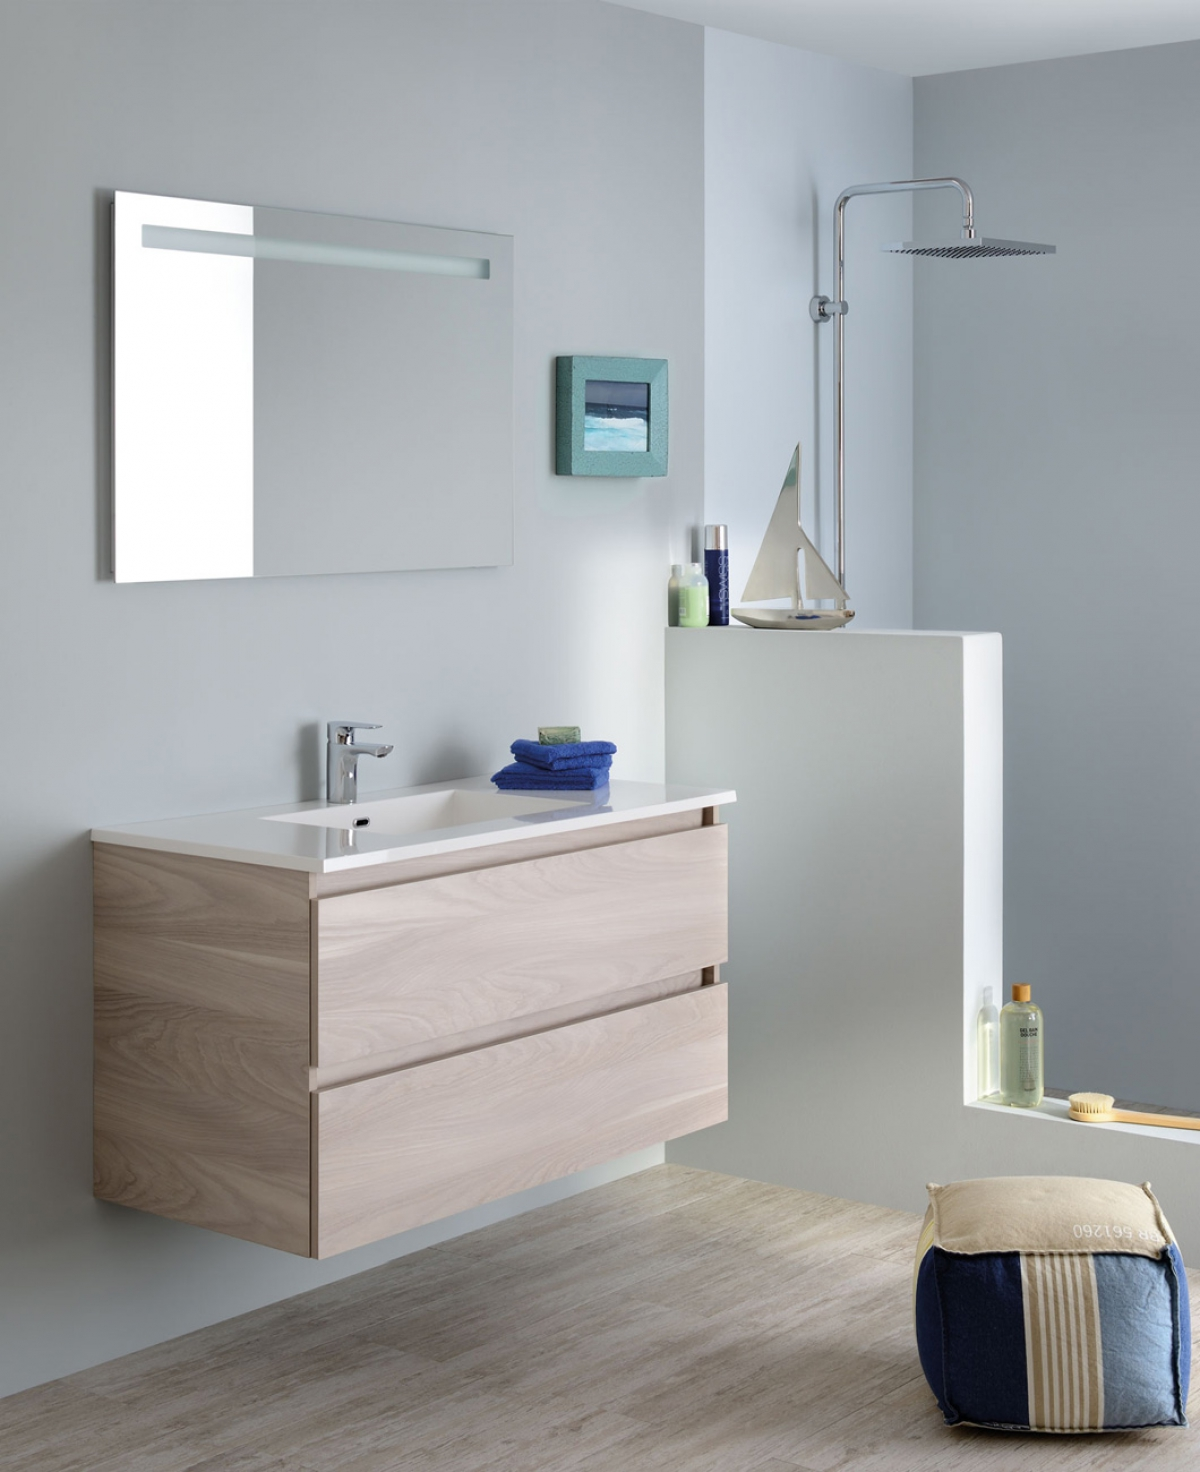 Meubles et table vasque sobro sanijura induscabel for Table salle de bain